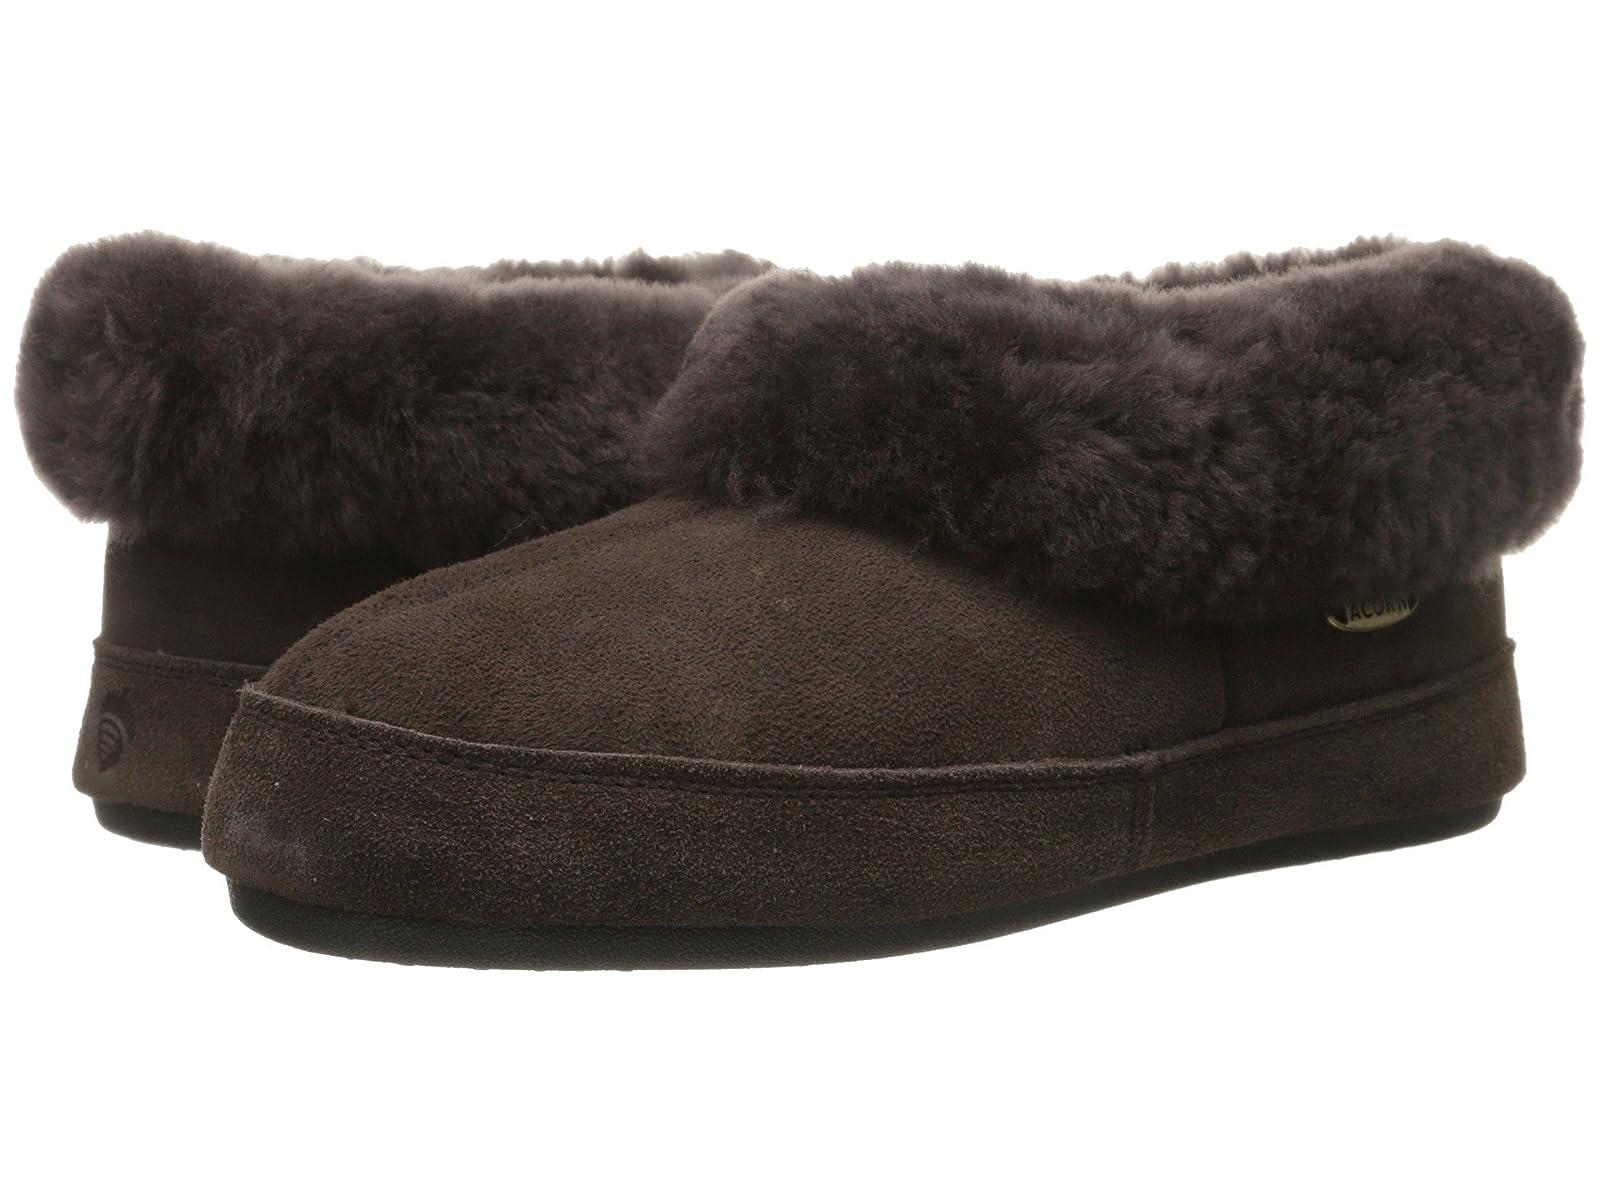 Acorn Oh Ewe IIAtmospheric grades have affordable shoes